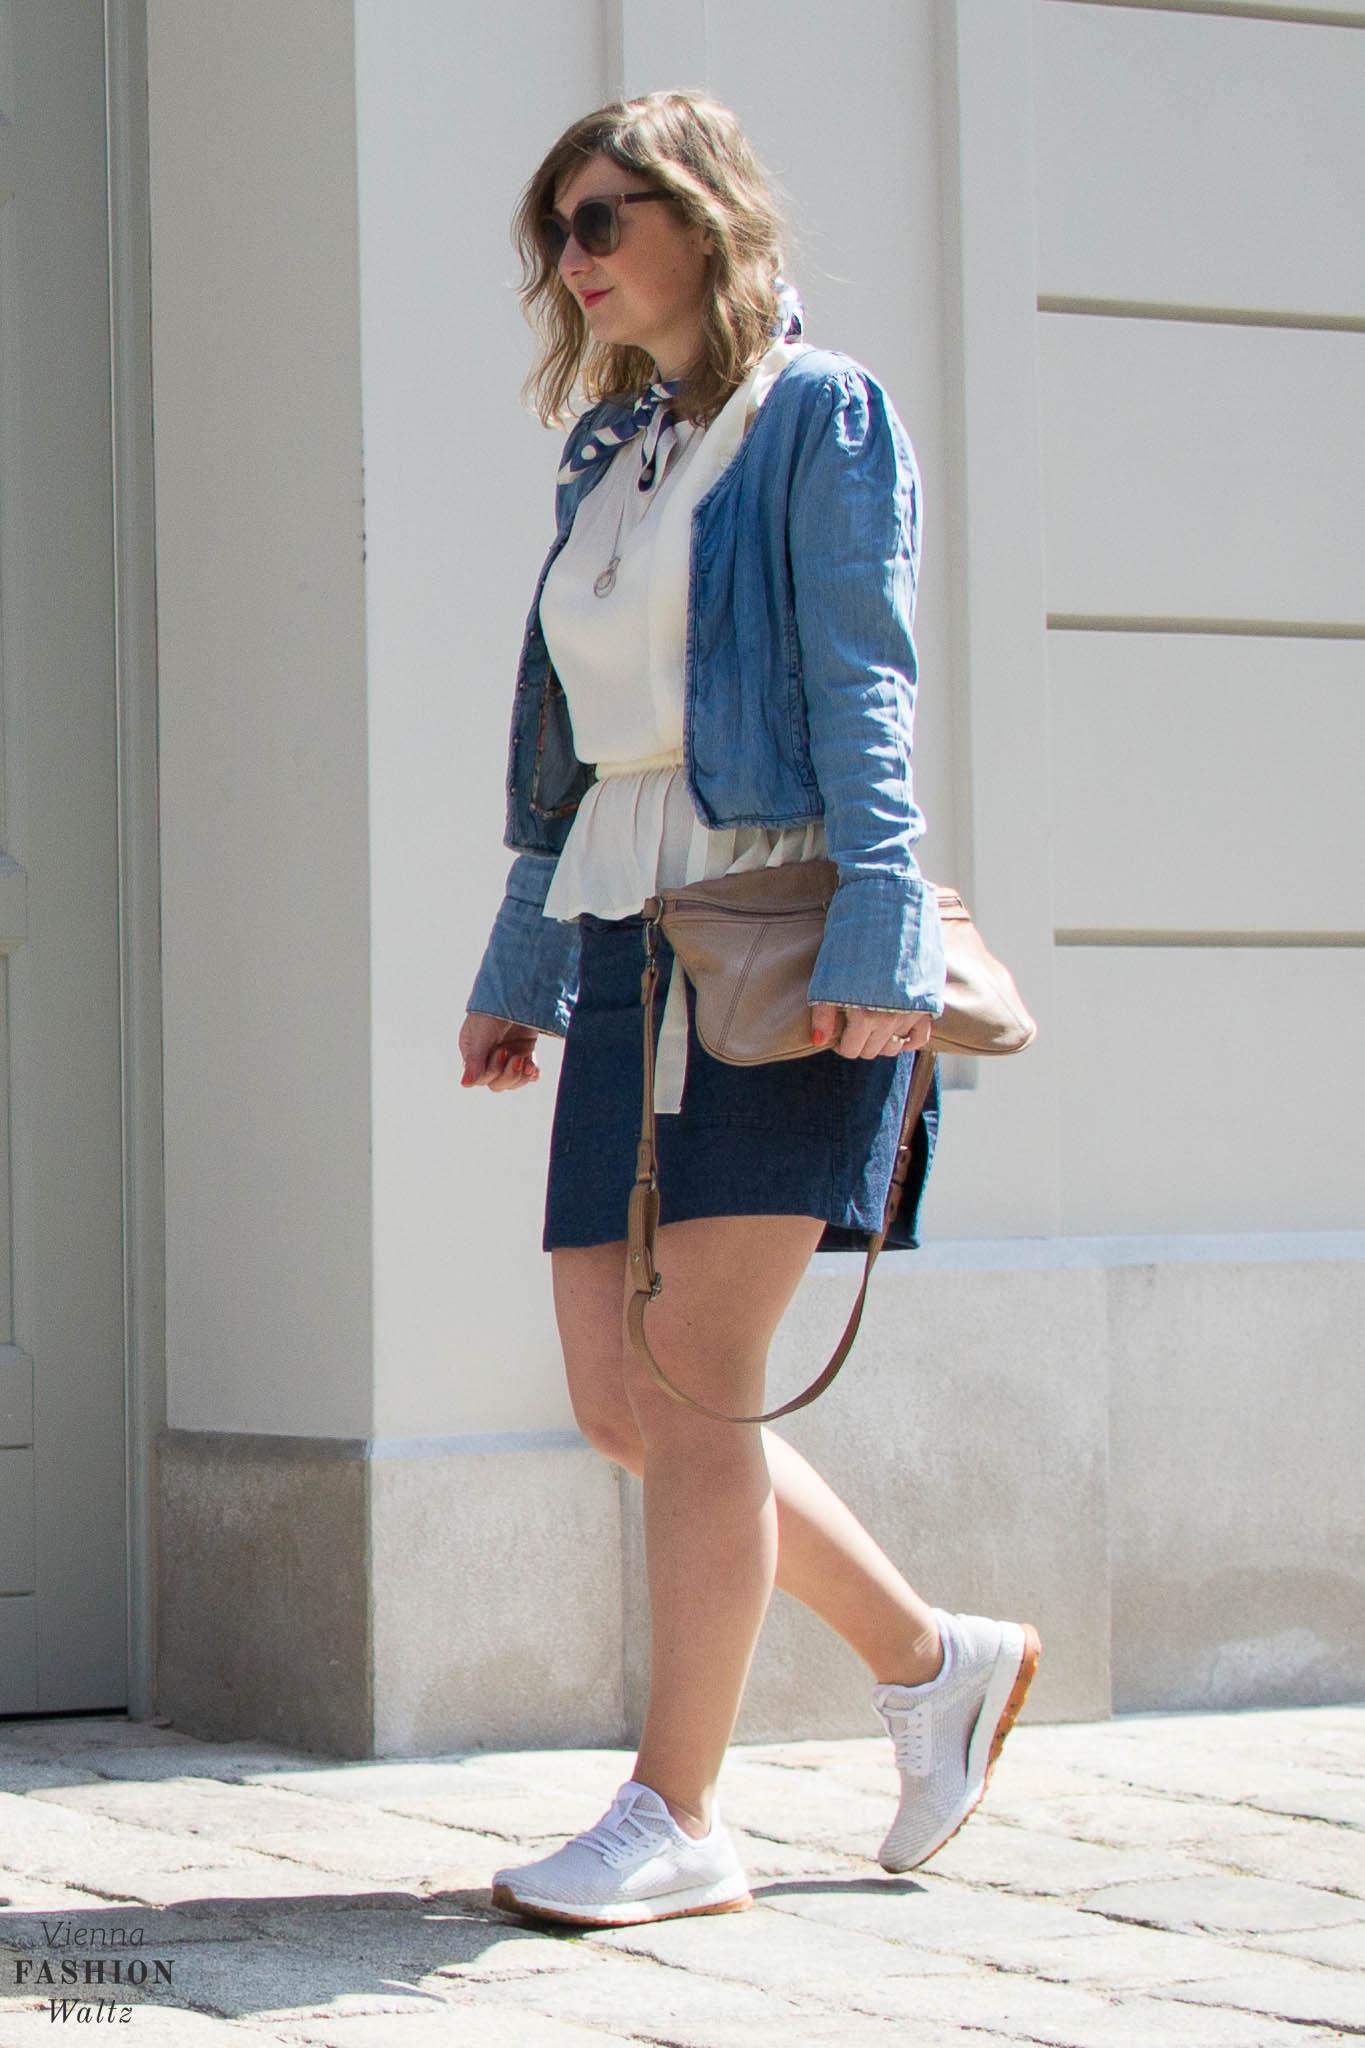 Denim Fashion Trends, Denim on Denim, Denim All Over, Jeans Jacket, Denim Skirt, Adidas Pure Boost